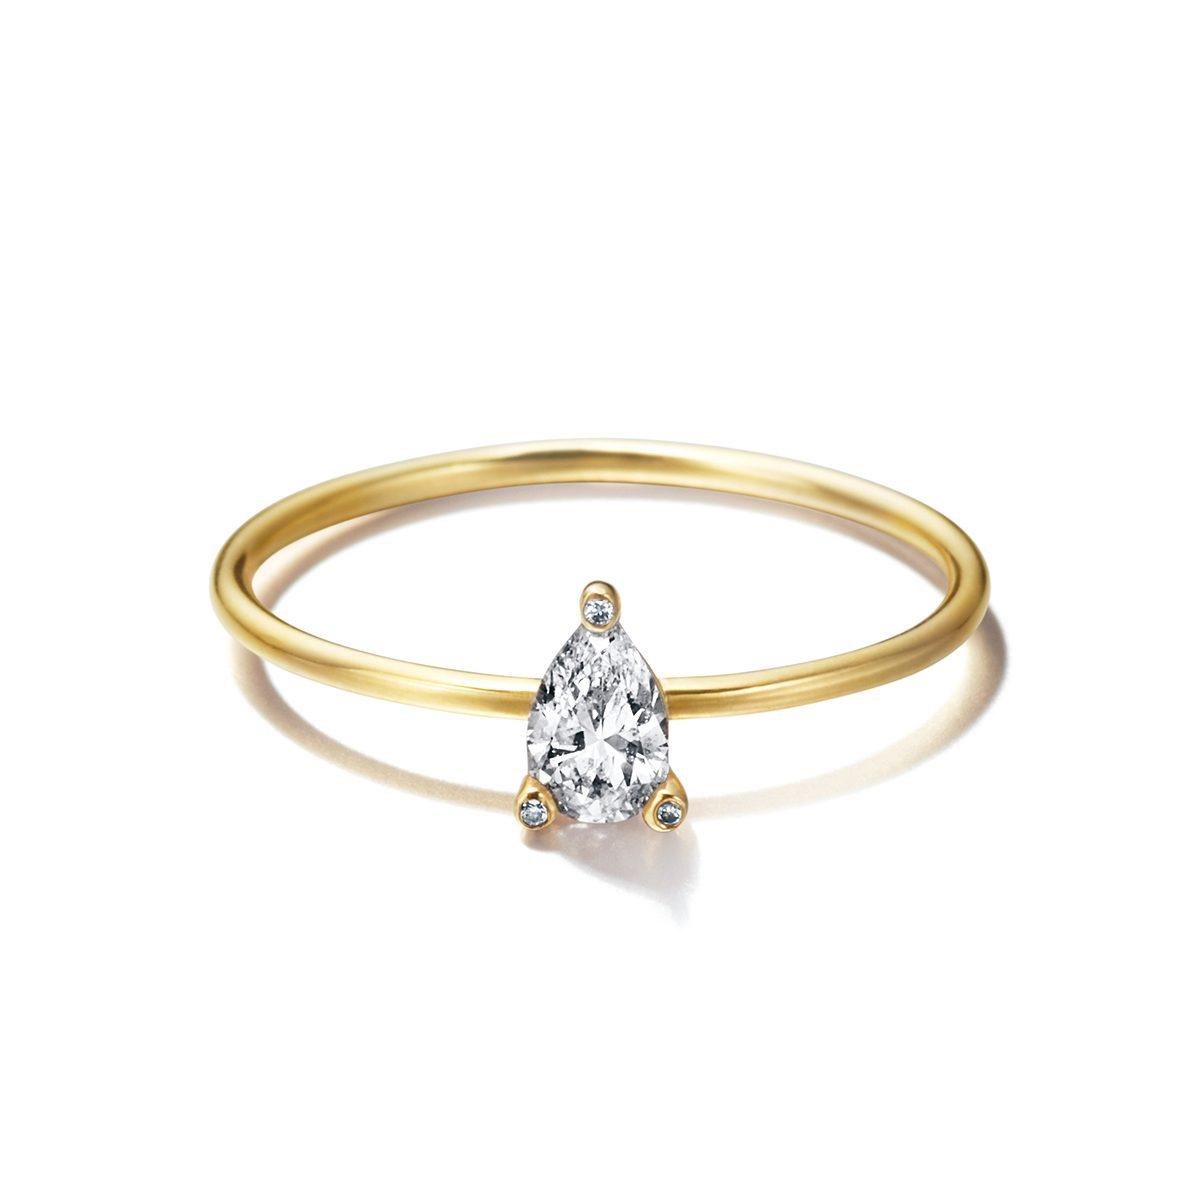 Sweat Pea Pear|Engagement Rings